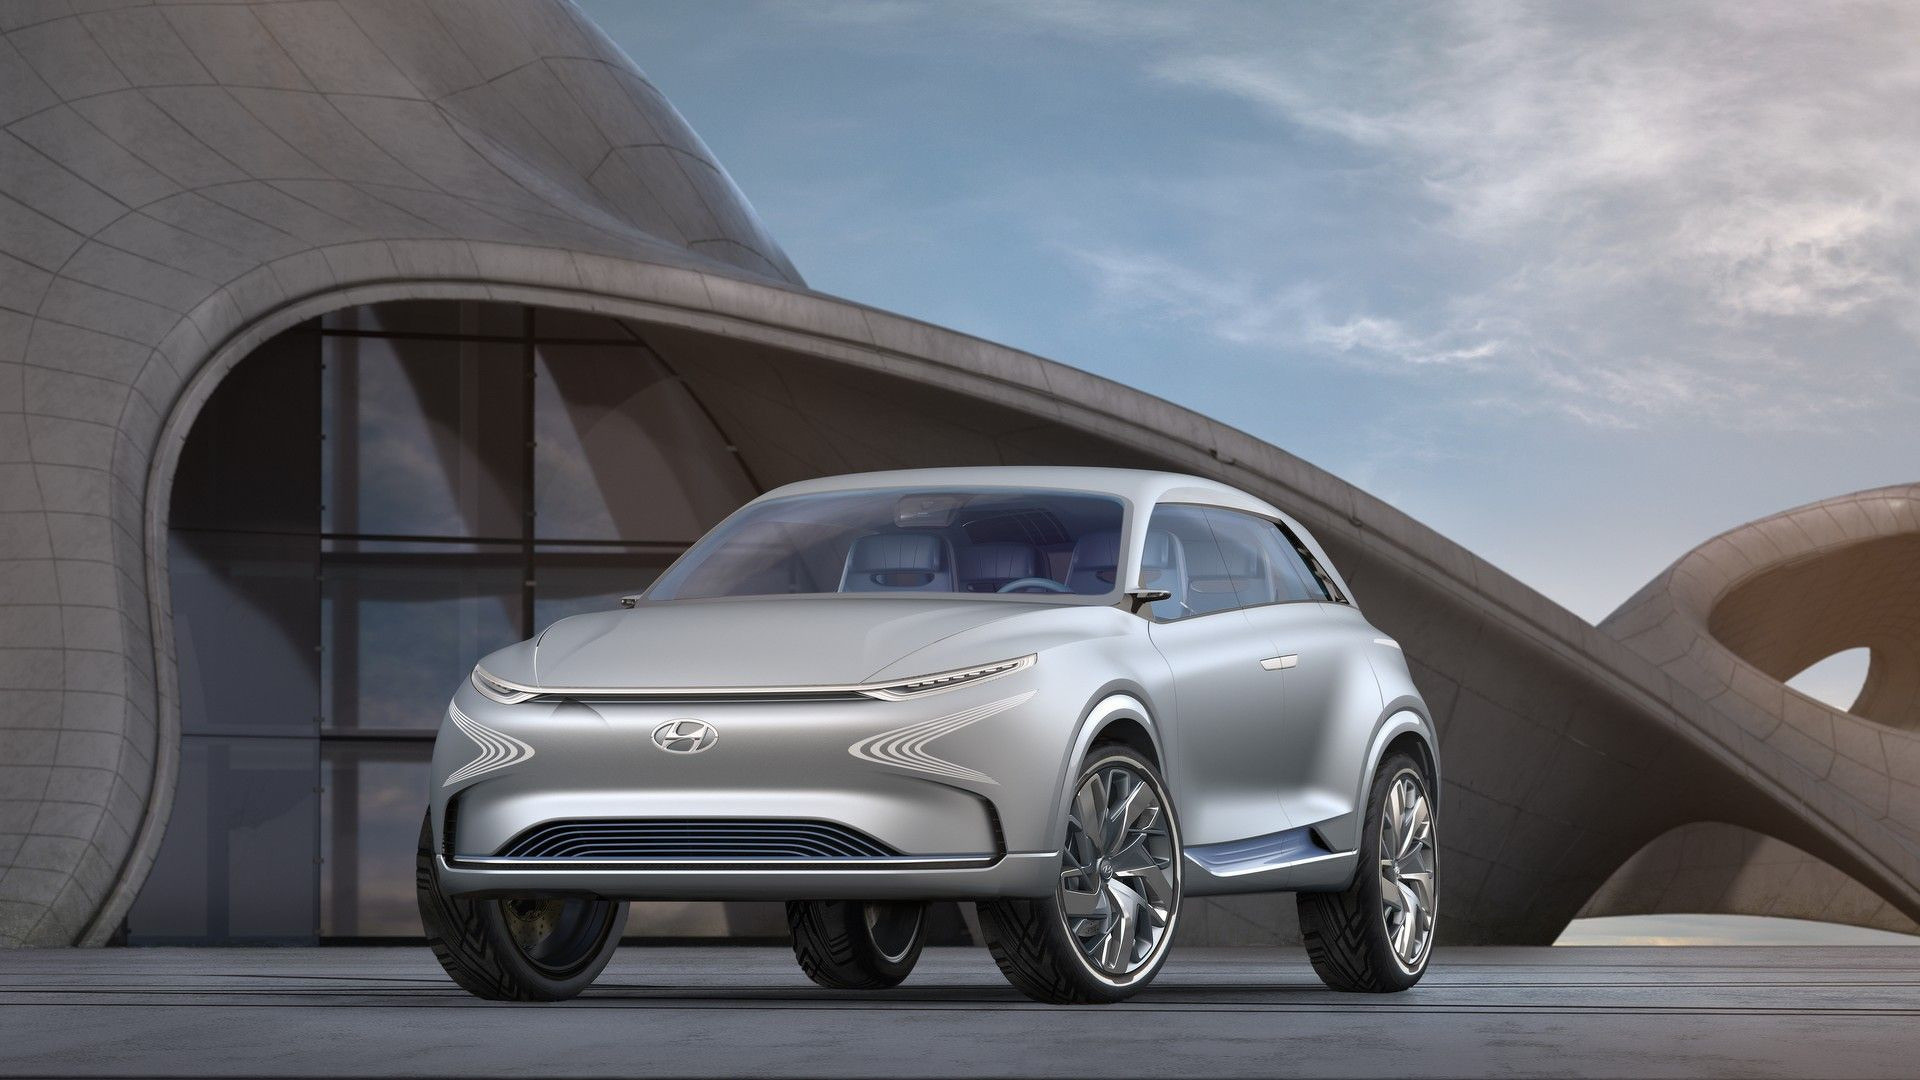 Foto de Hyundai FE Fuel Cell Concept 2017 (1/14)